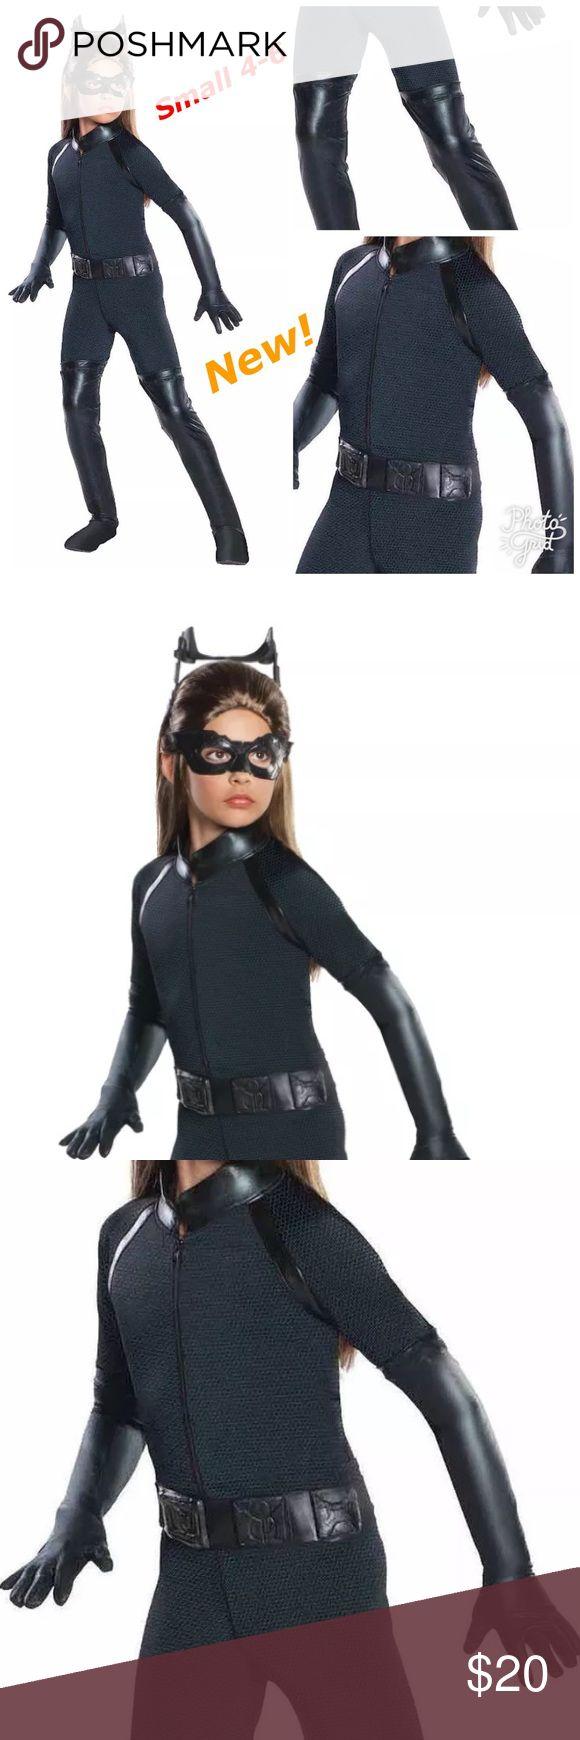 Catwoman Cat Woman Girls Halloween Costume New Includes: -Jumpsuit  -Belt -Eye Mask -Headpiece    Gloves NOT included!  New without tag! Costumes Halloween